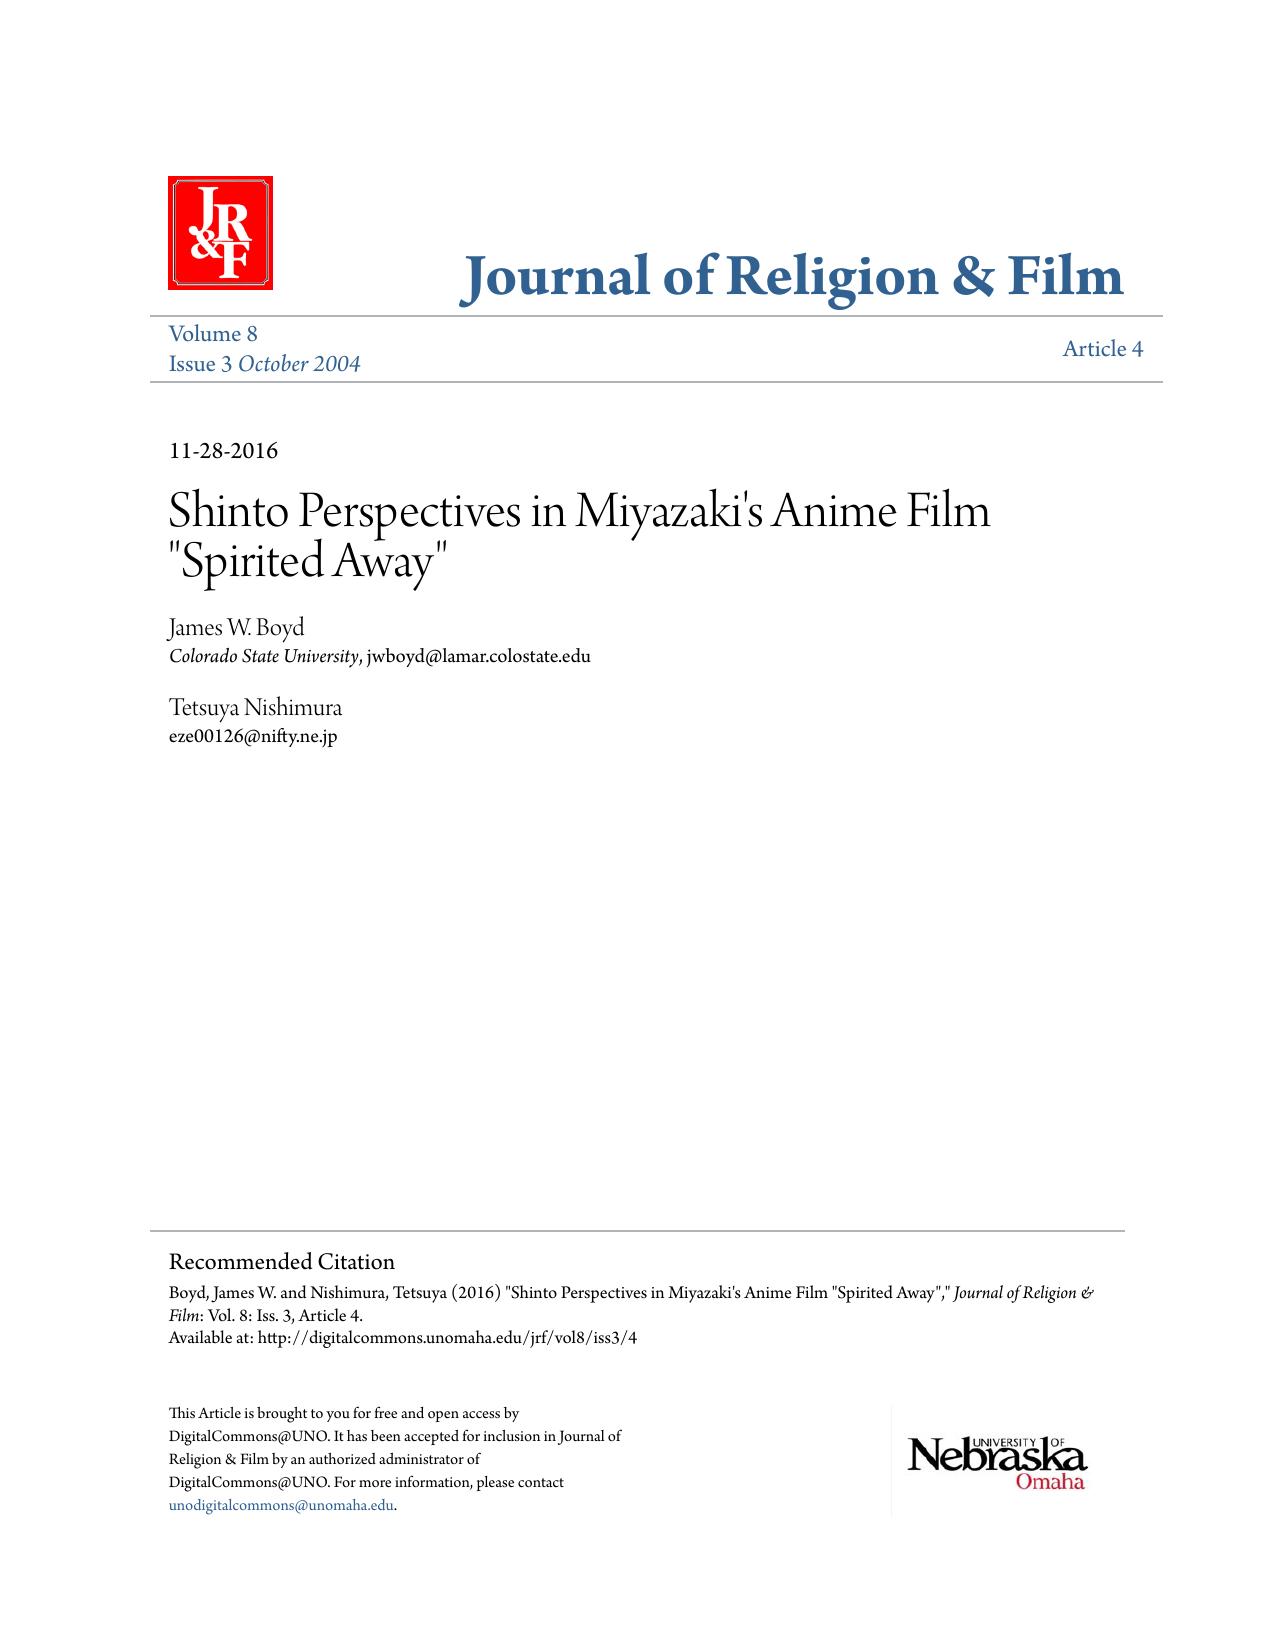 Shinto Perspectives In Miyazakis Anime Film Spirited Away